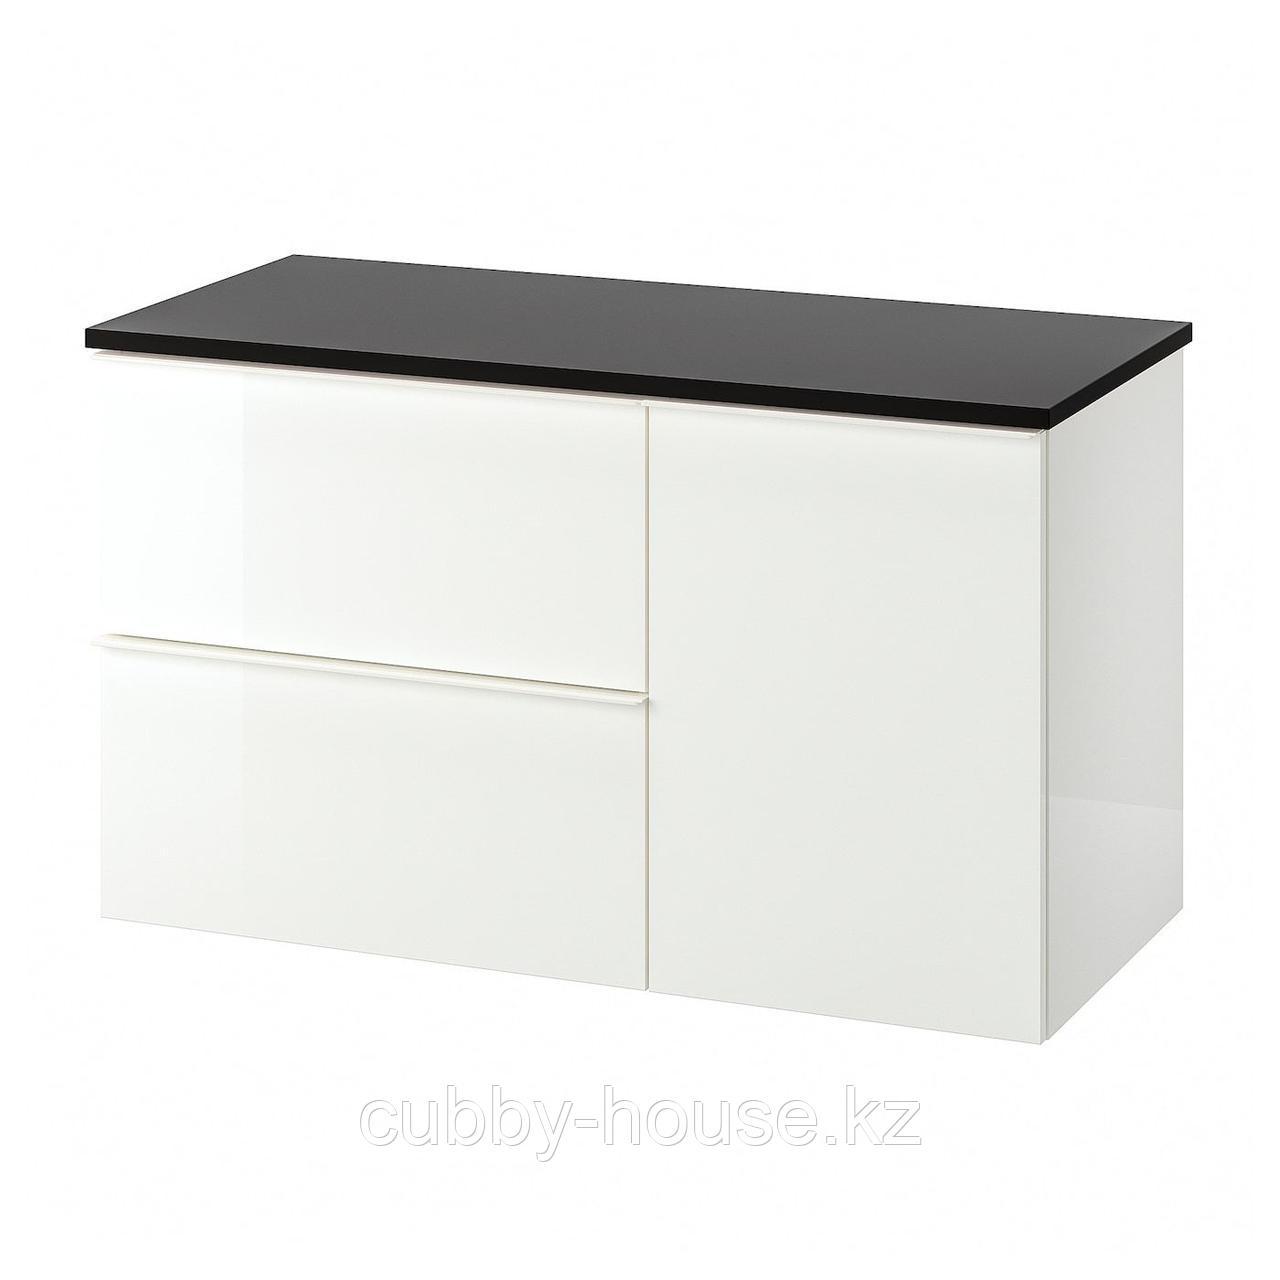 ГОДМОРГОН / ТОЛКЕН Шкаф для раковины с 2 ящ, глянцевый белый, бамбук, 102x49x60 см